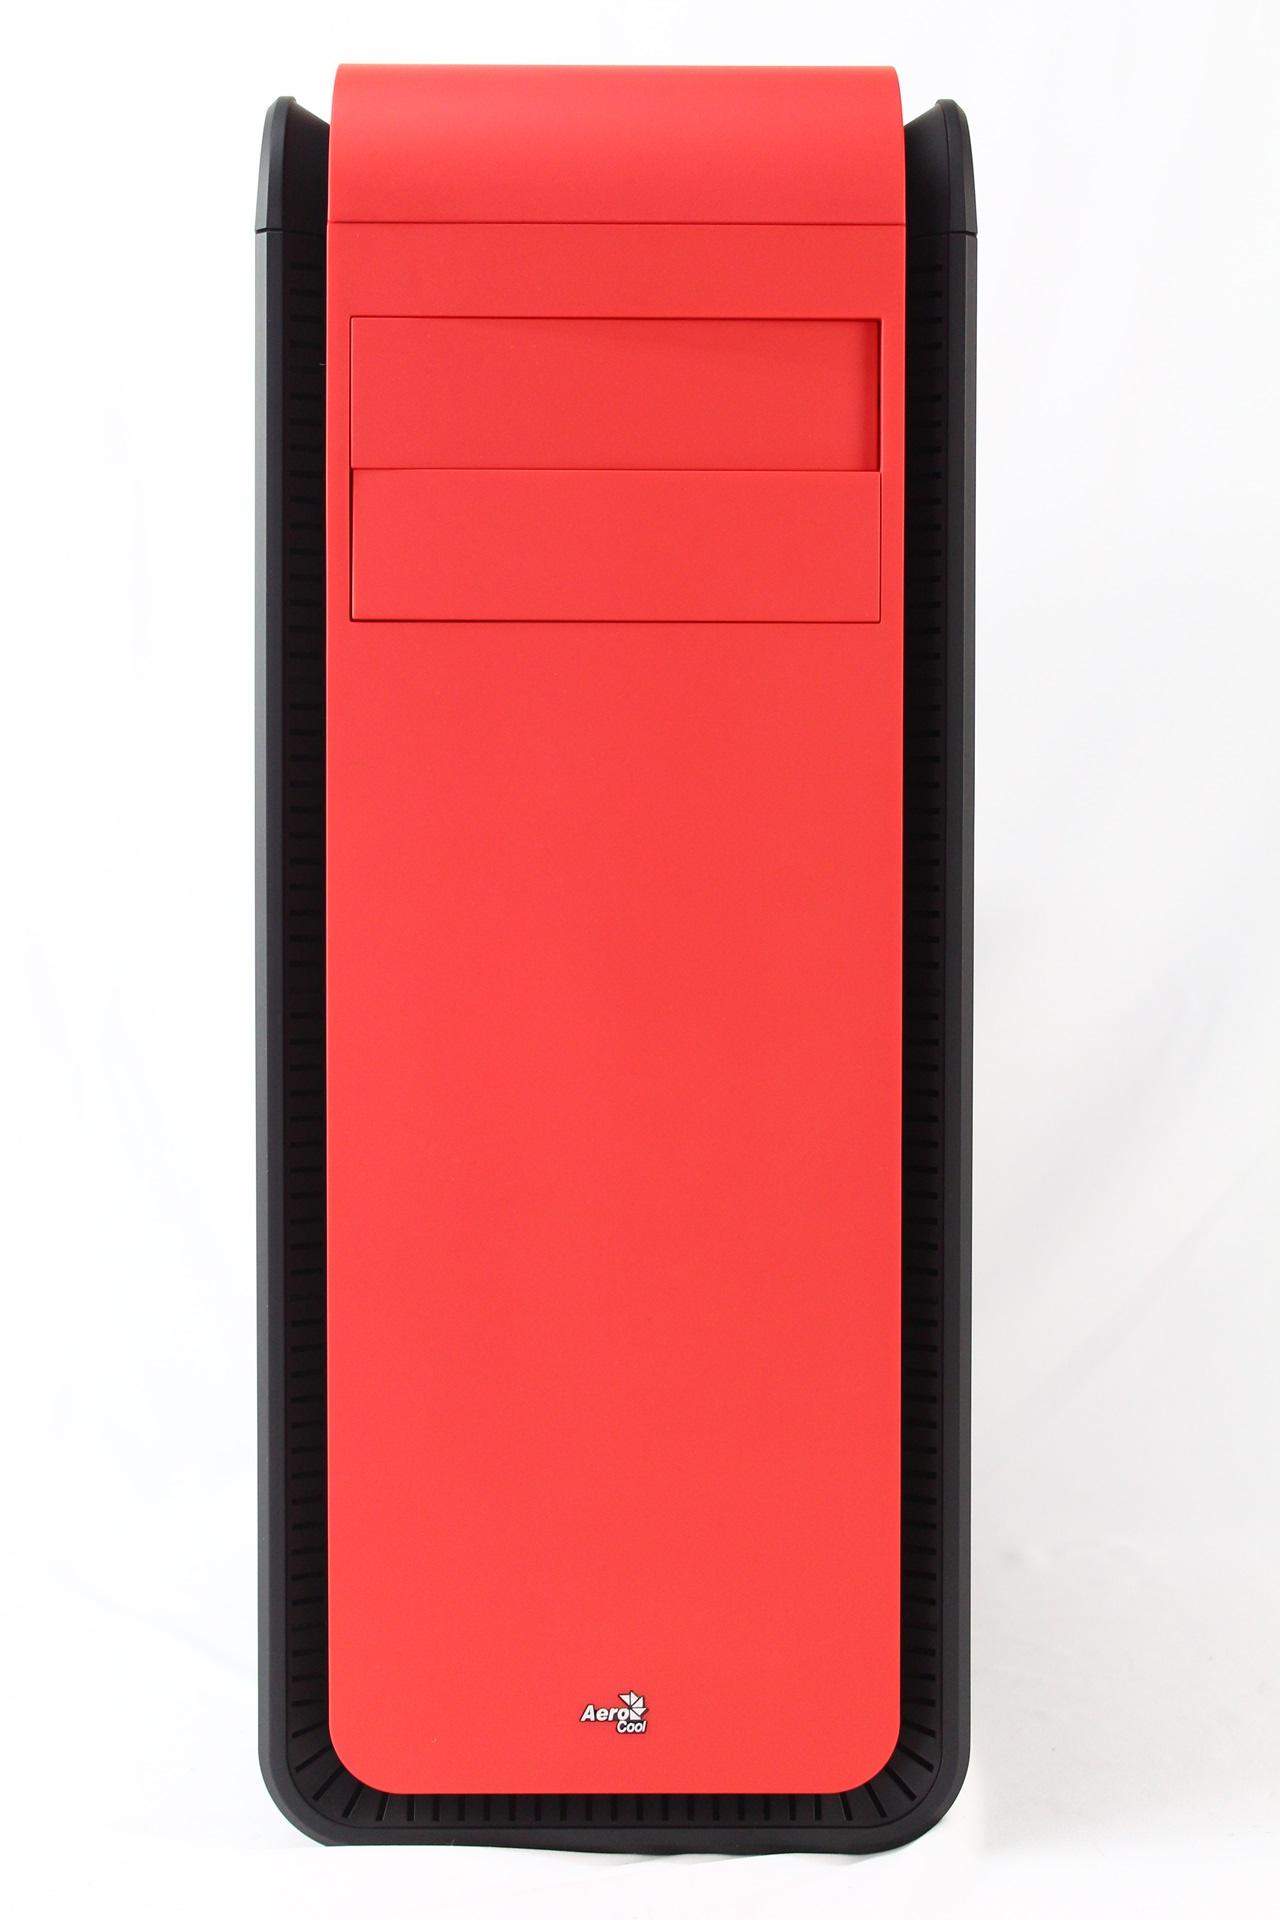 [XF]溫度感測,風扇轉速控制通通給,Aerocool DS 200機殼開箱